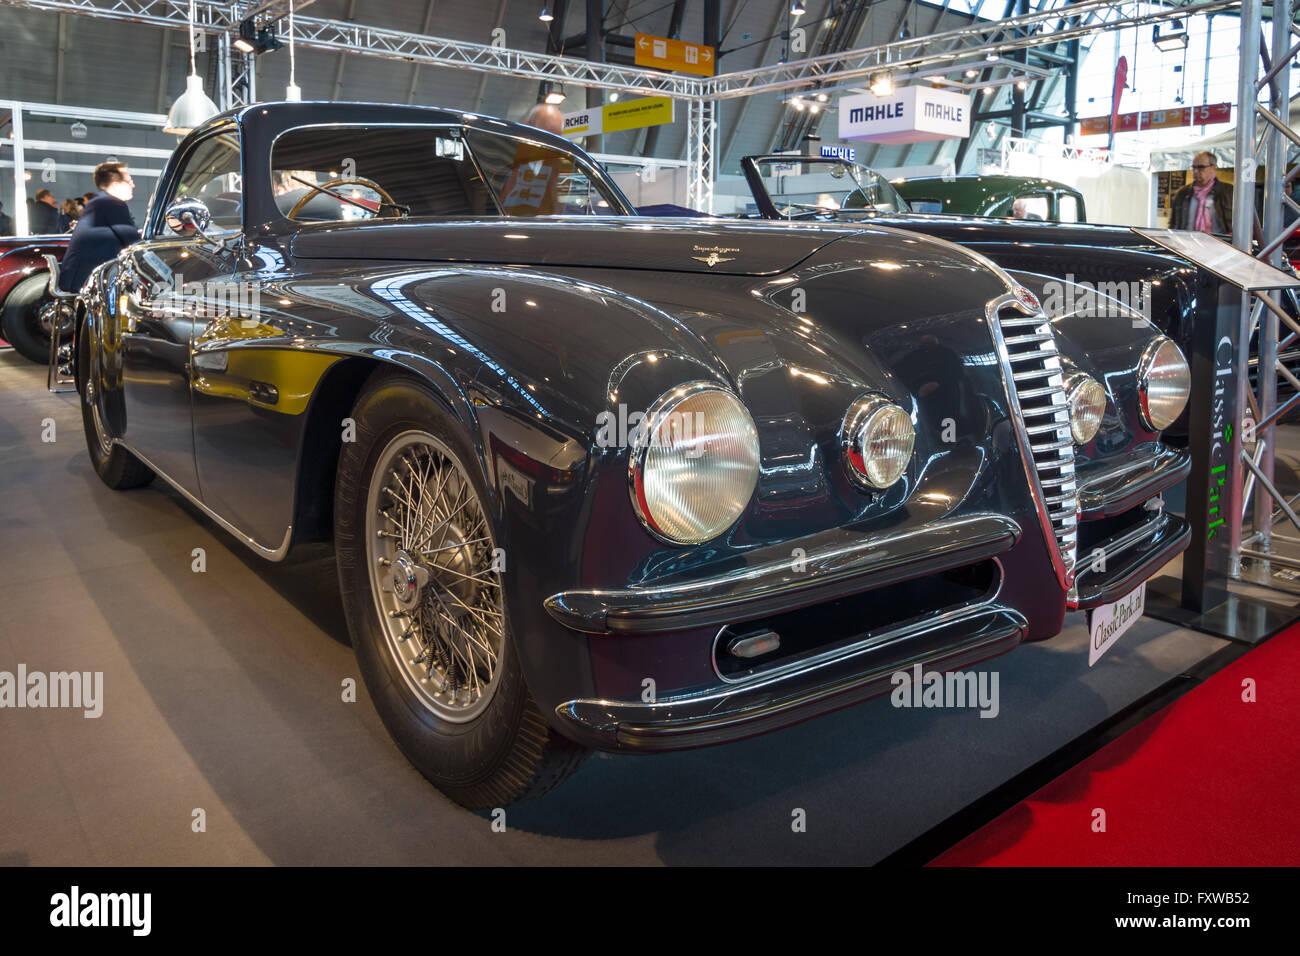 Vintage Car Alfa Romeo 6C 2500 SS Touring Superleggera Coupe, 1948